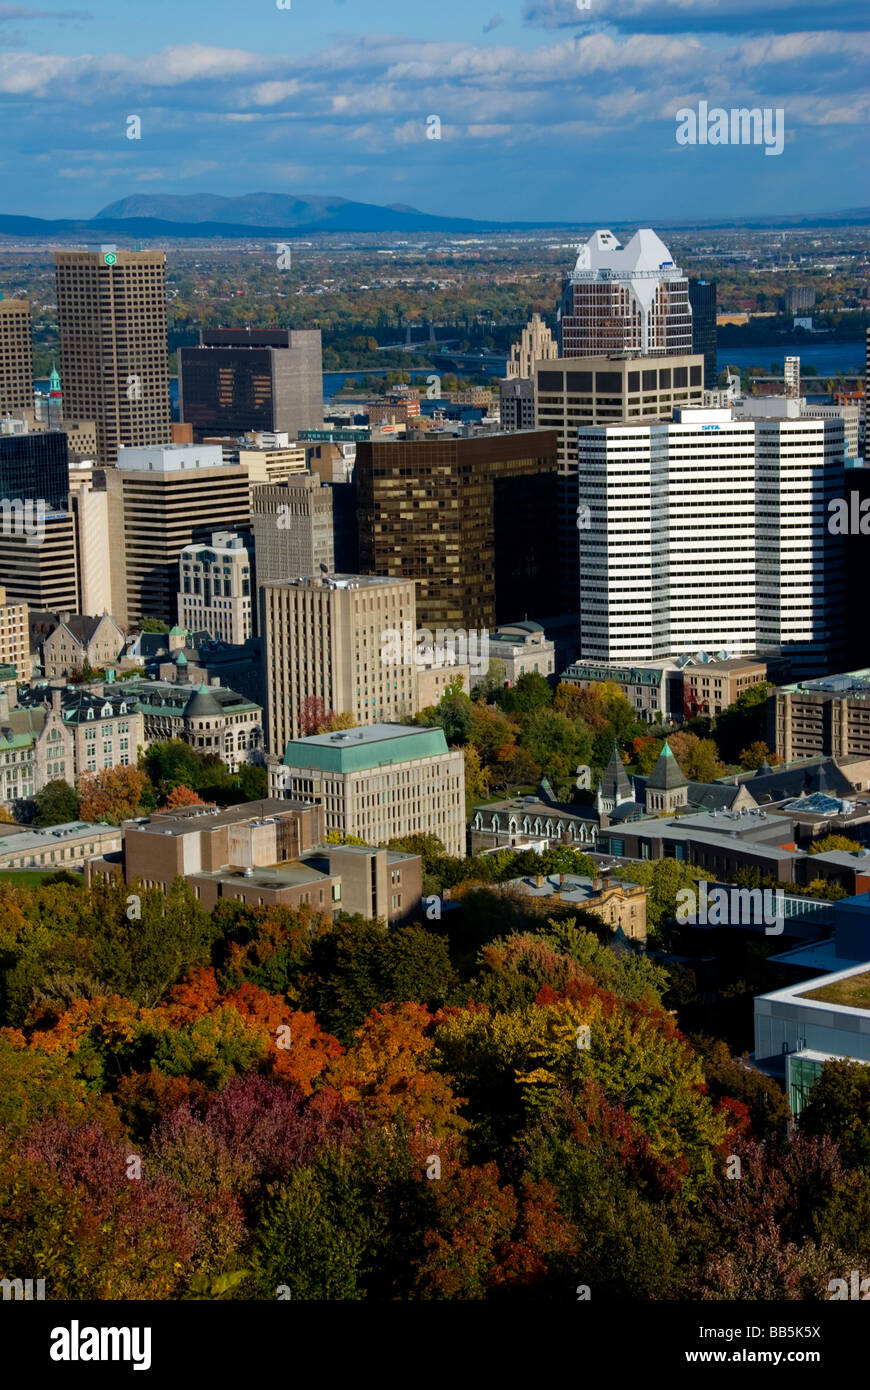 Canada, Quebec, Montreal cityscape - Stock Image